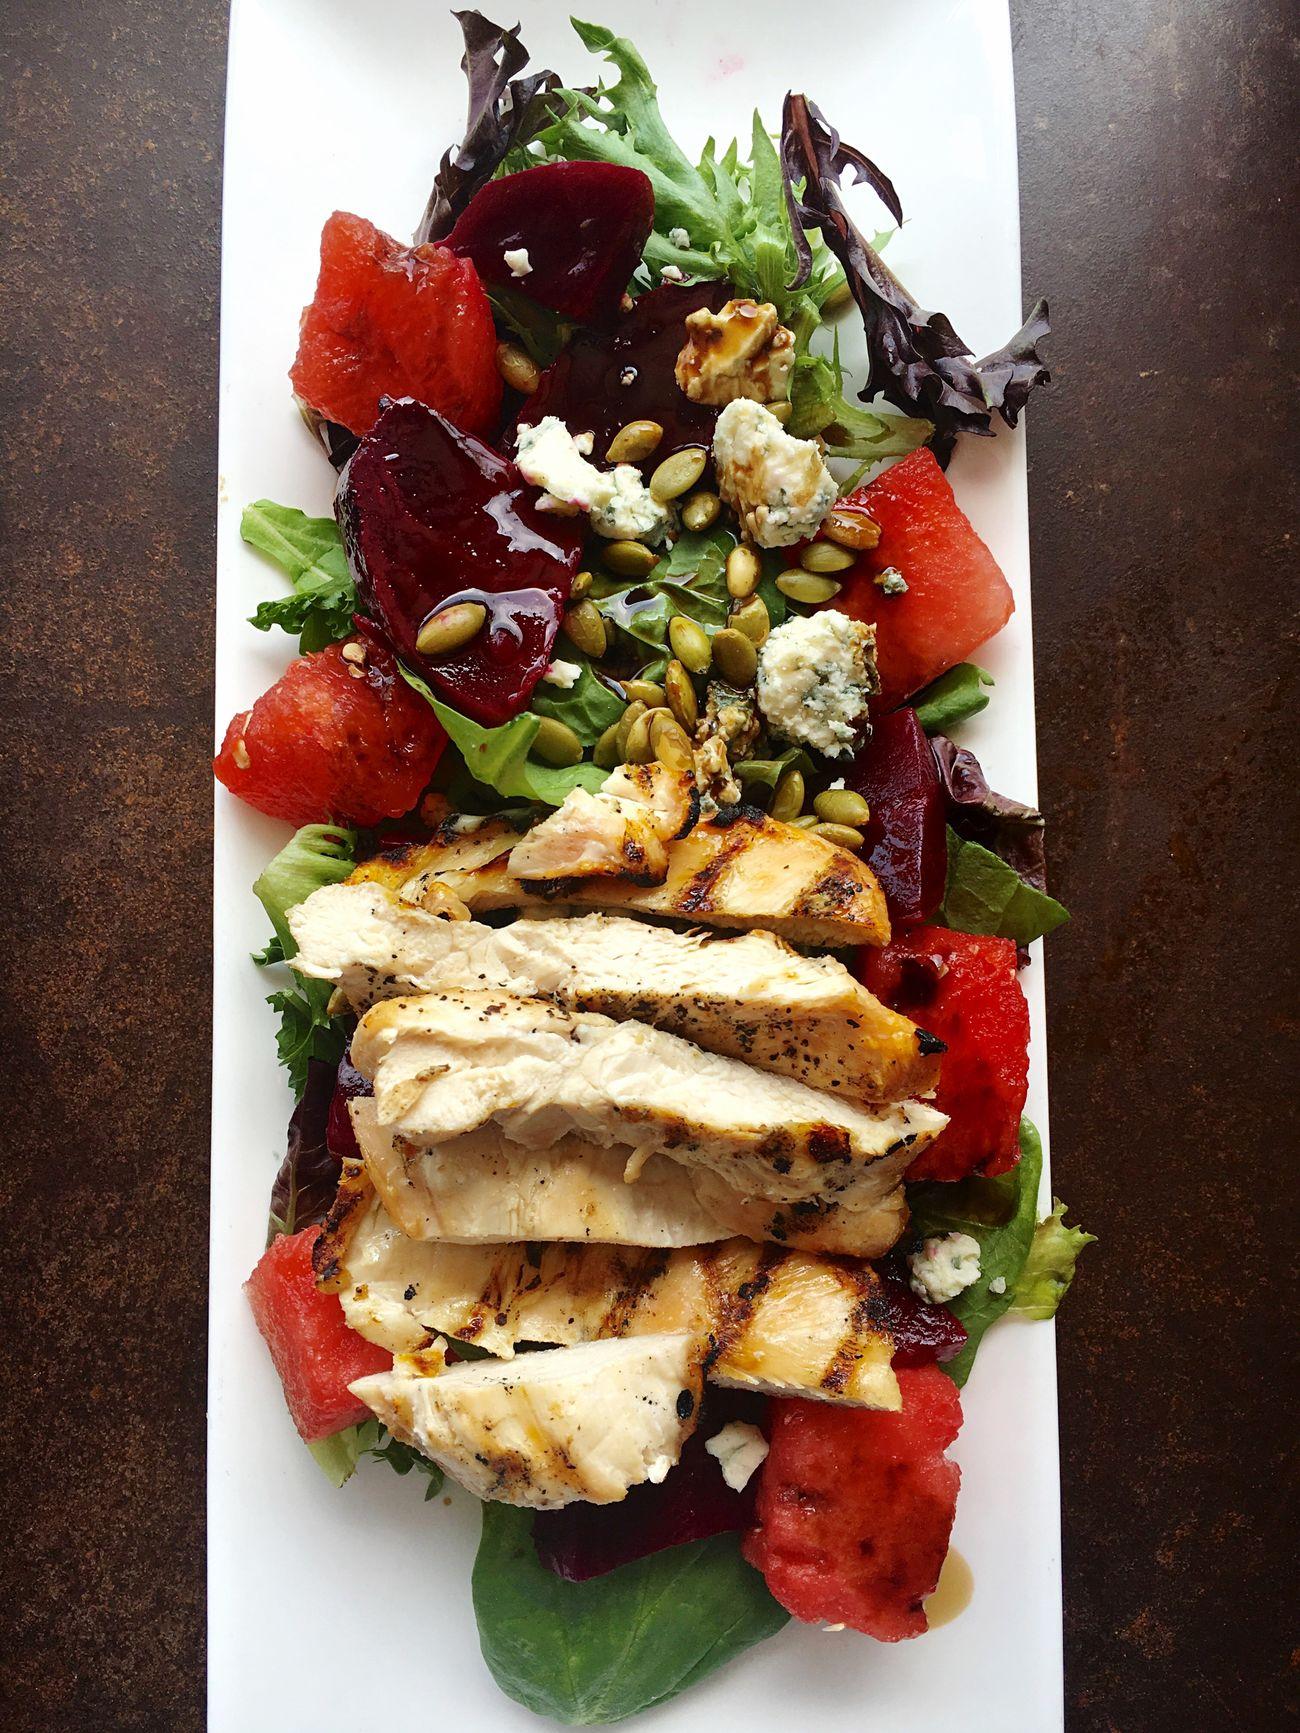 Food Photography Foodie Food Art Salad Beets Watermelon Feta Seeds Lettuce Chicken Salad Gourmet